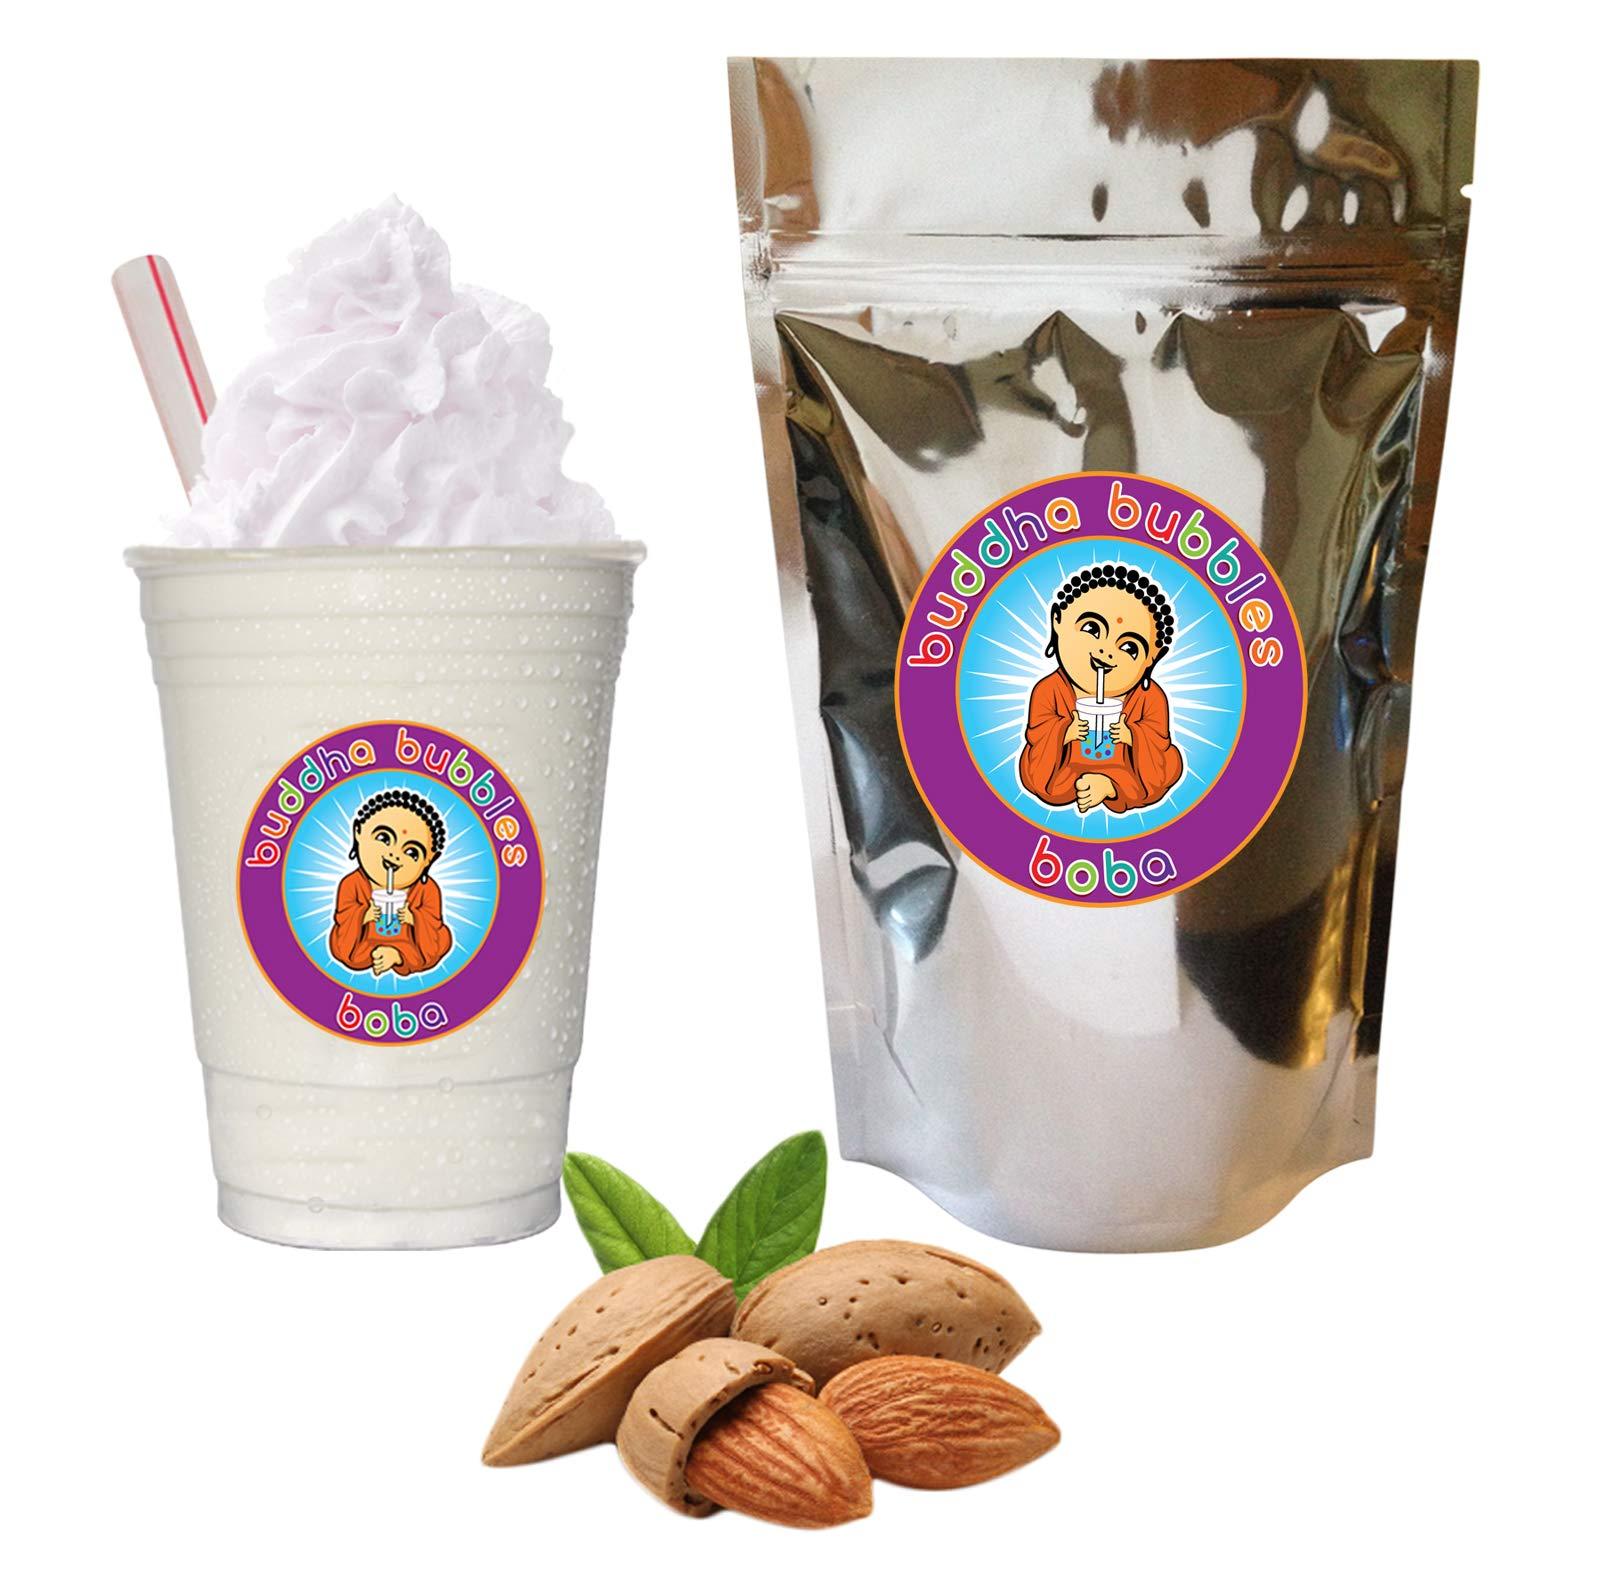 Almond Boba / Bubble Tea Drink Mix Powder By Buddha Bubbles Boba 10 Ounces (283 Grams)